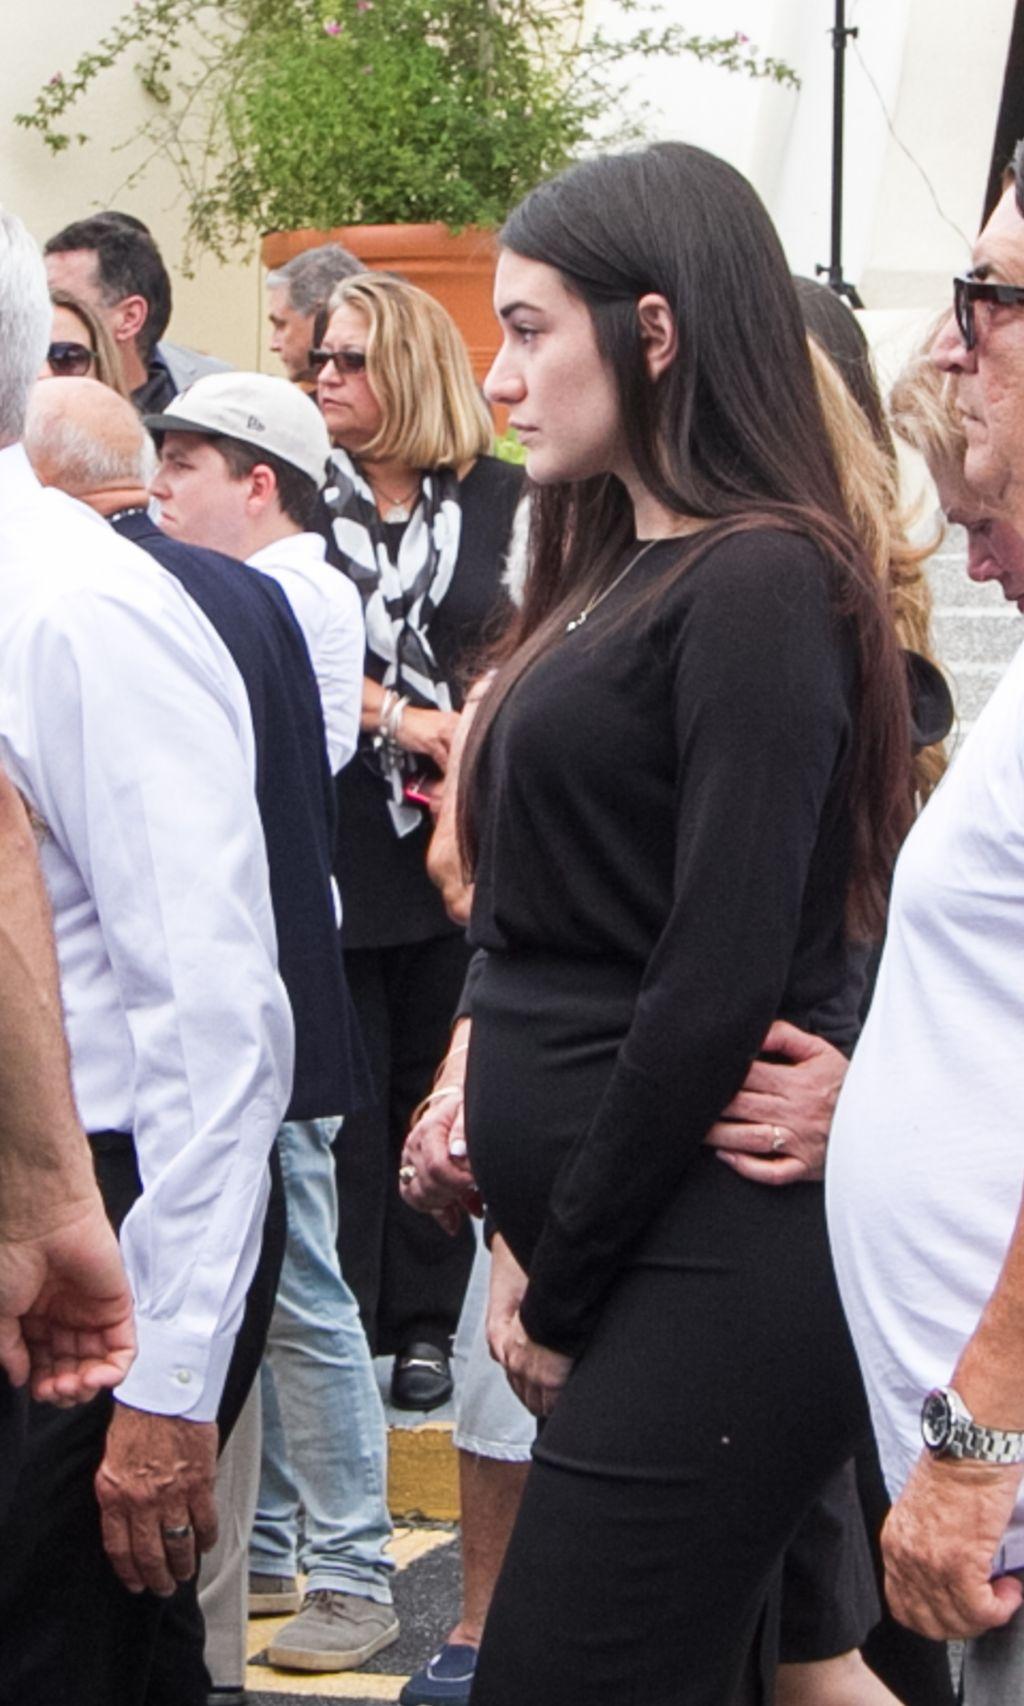 Jose Fernandez Funeral Procession And Public Memorial